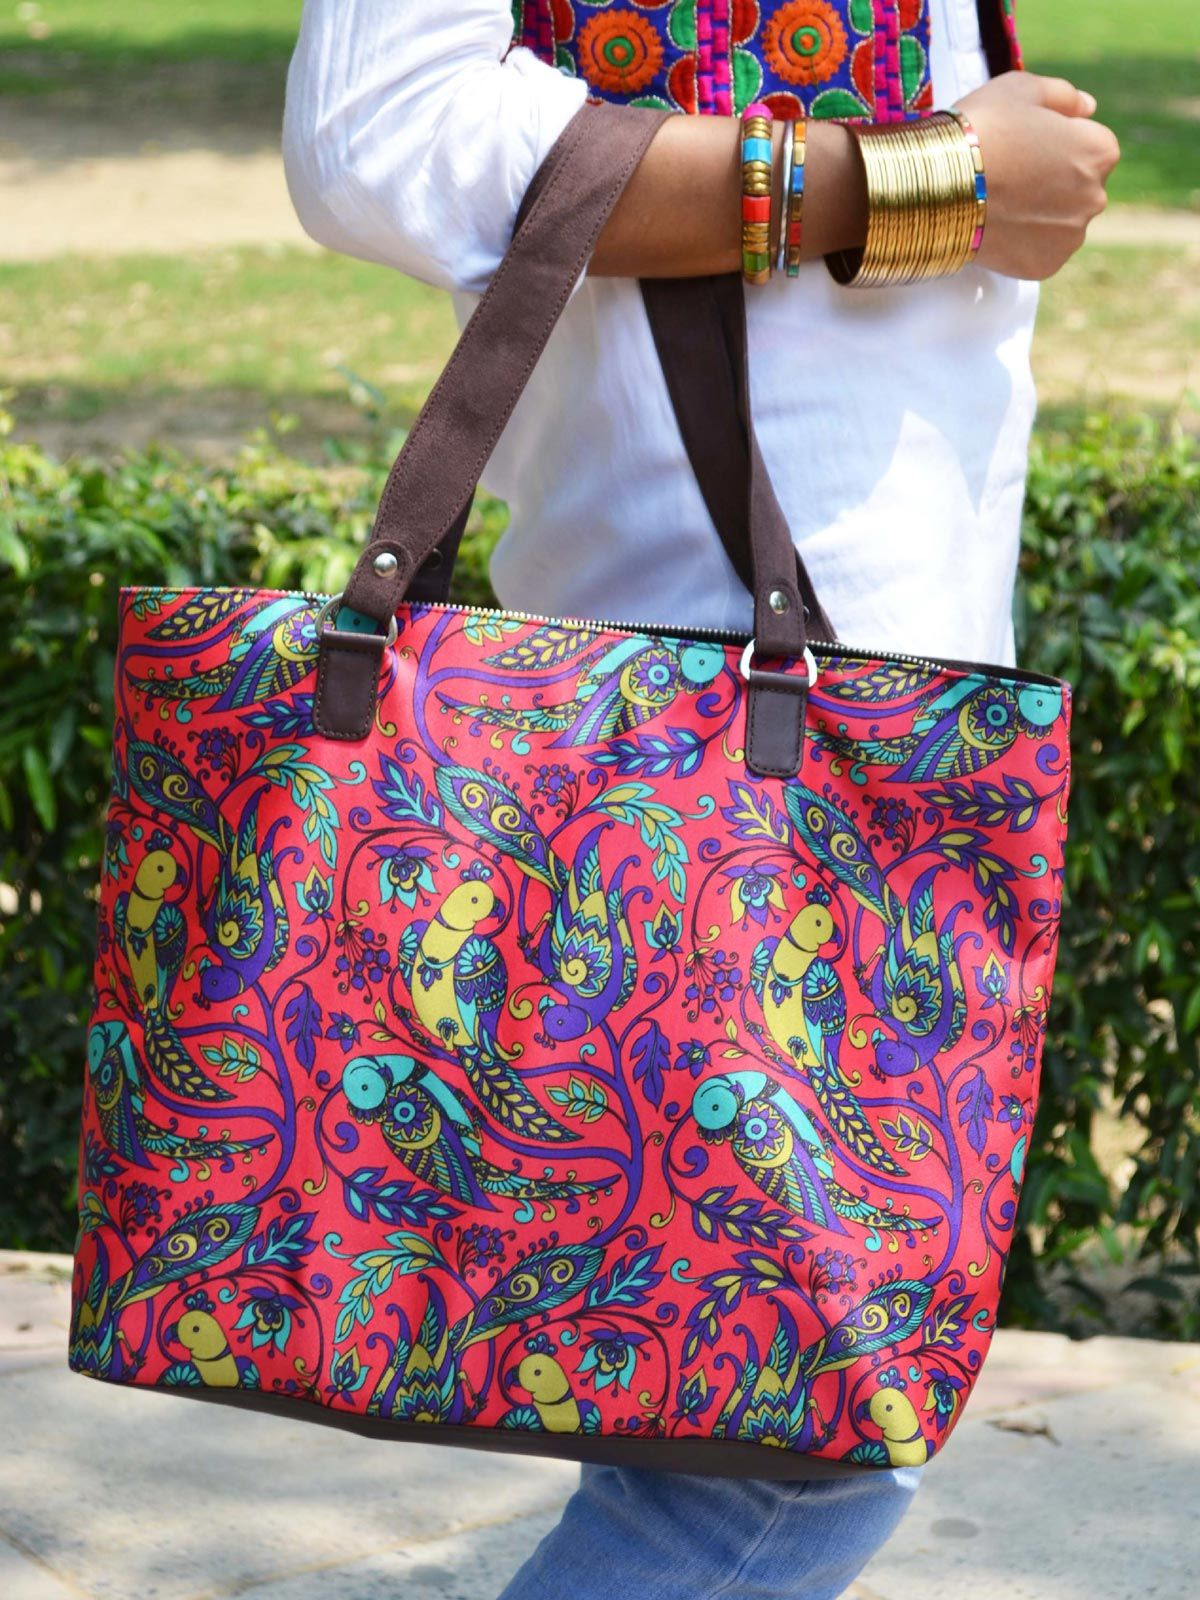 Parrot Printed Handbag